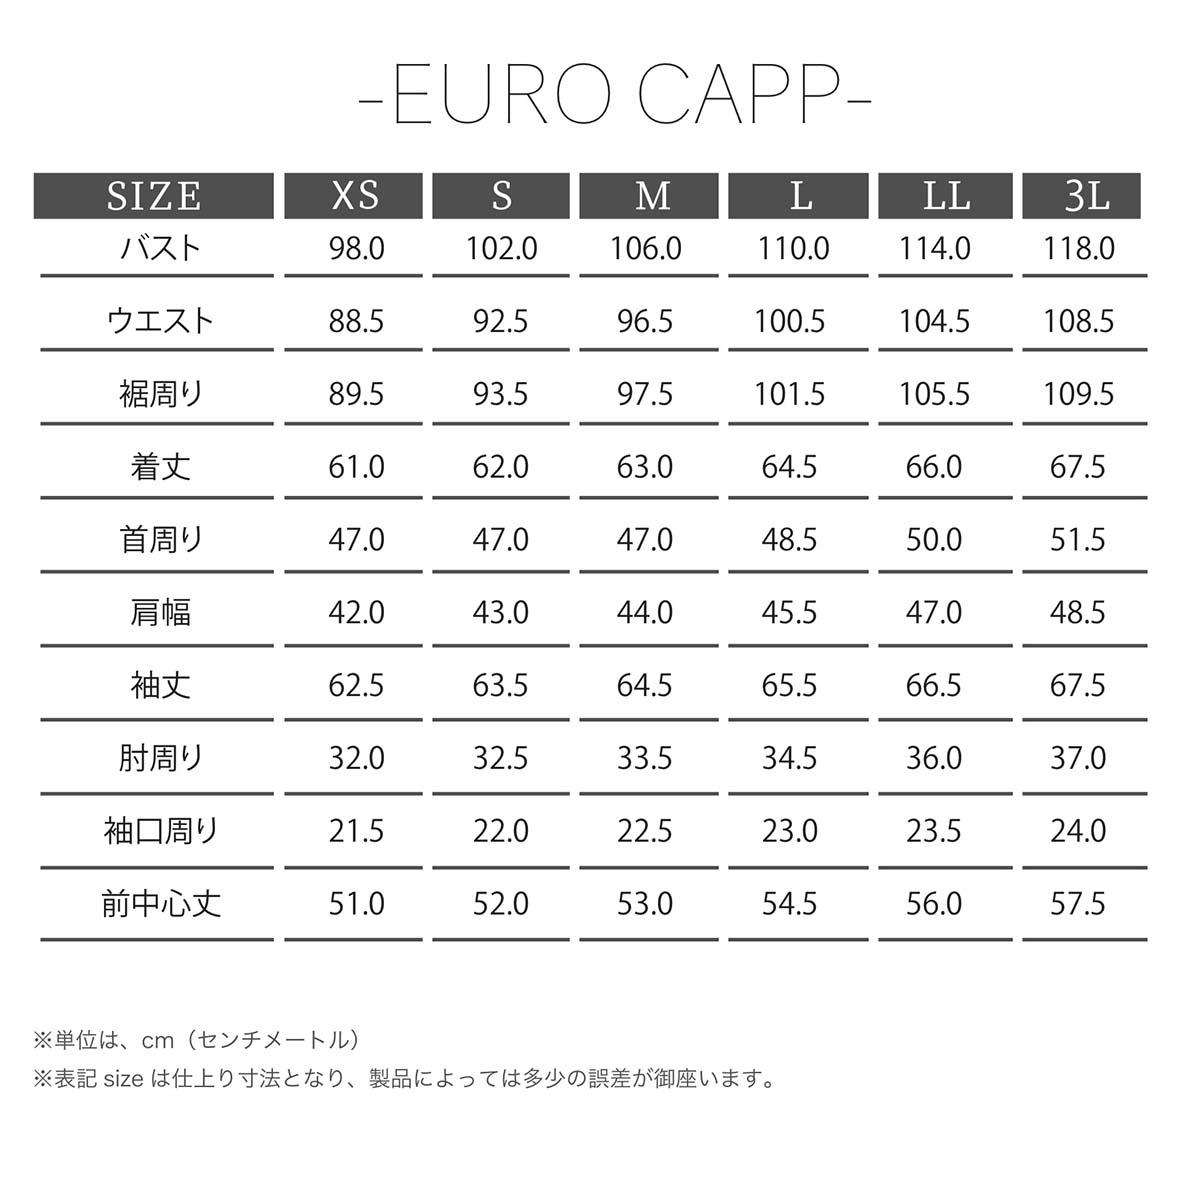 KADOYA(カドヤ) K'S LEATHER  EURO CAPP ユーロカップ フード着脱式 ネイビー